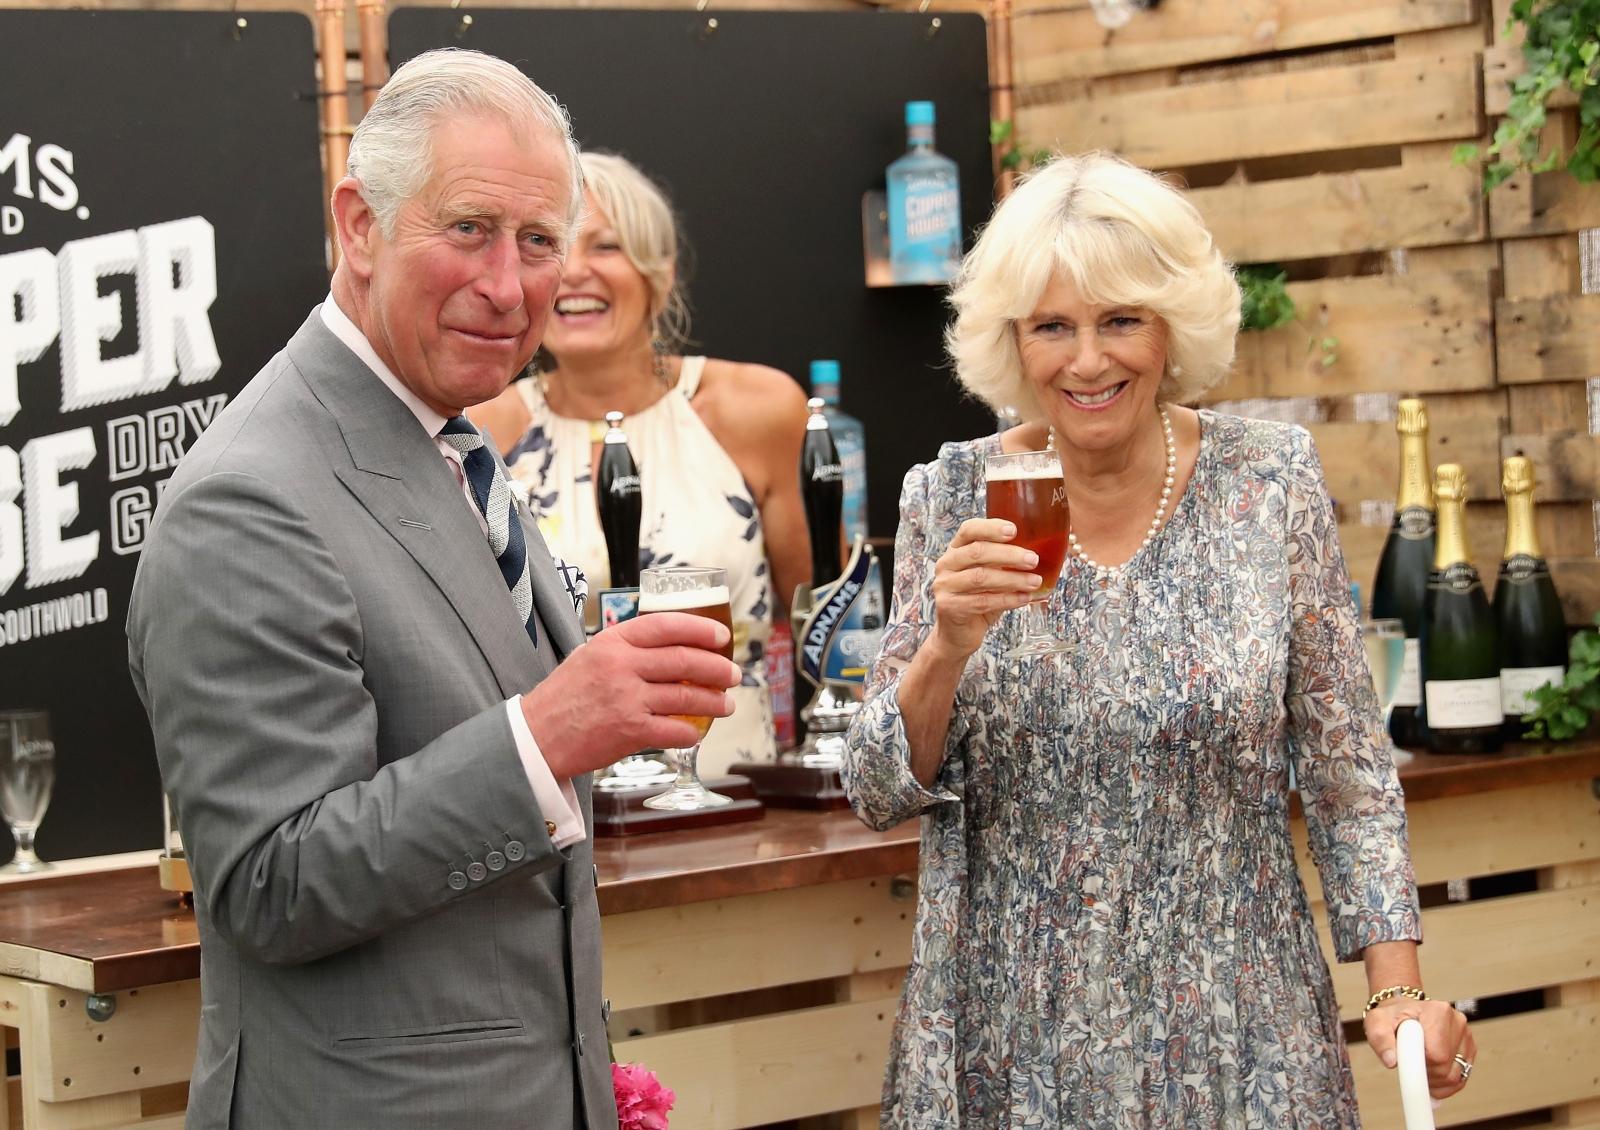 Prince Charles and Camilla visit Sandringham